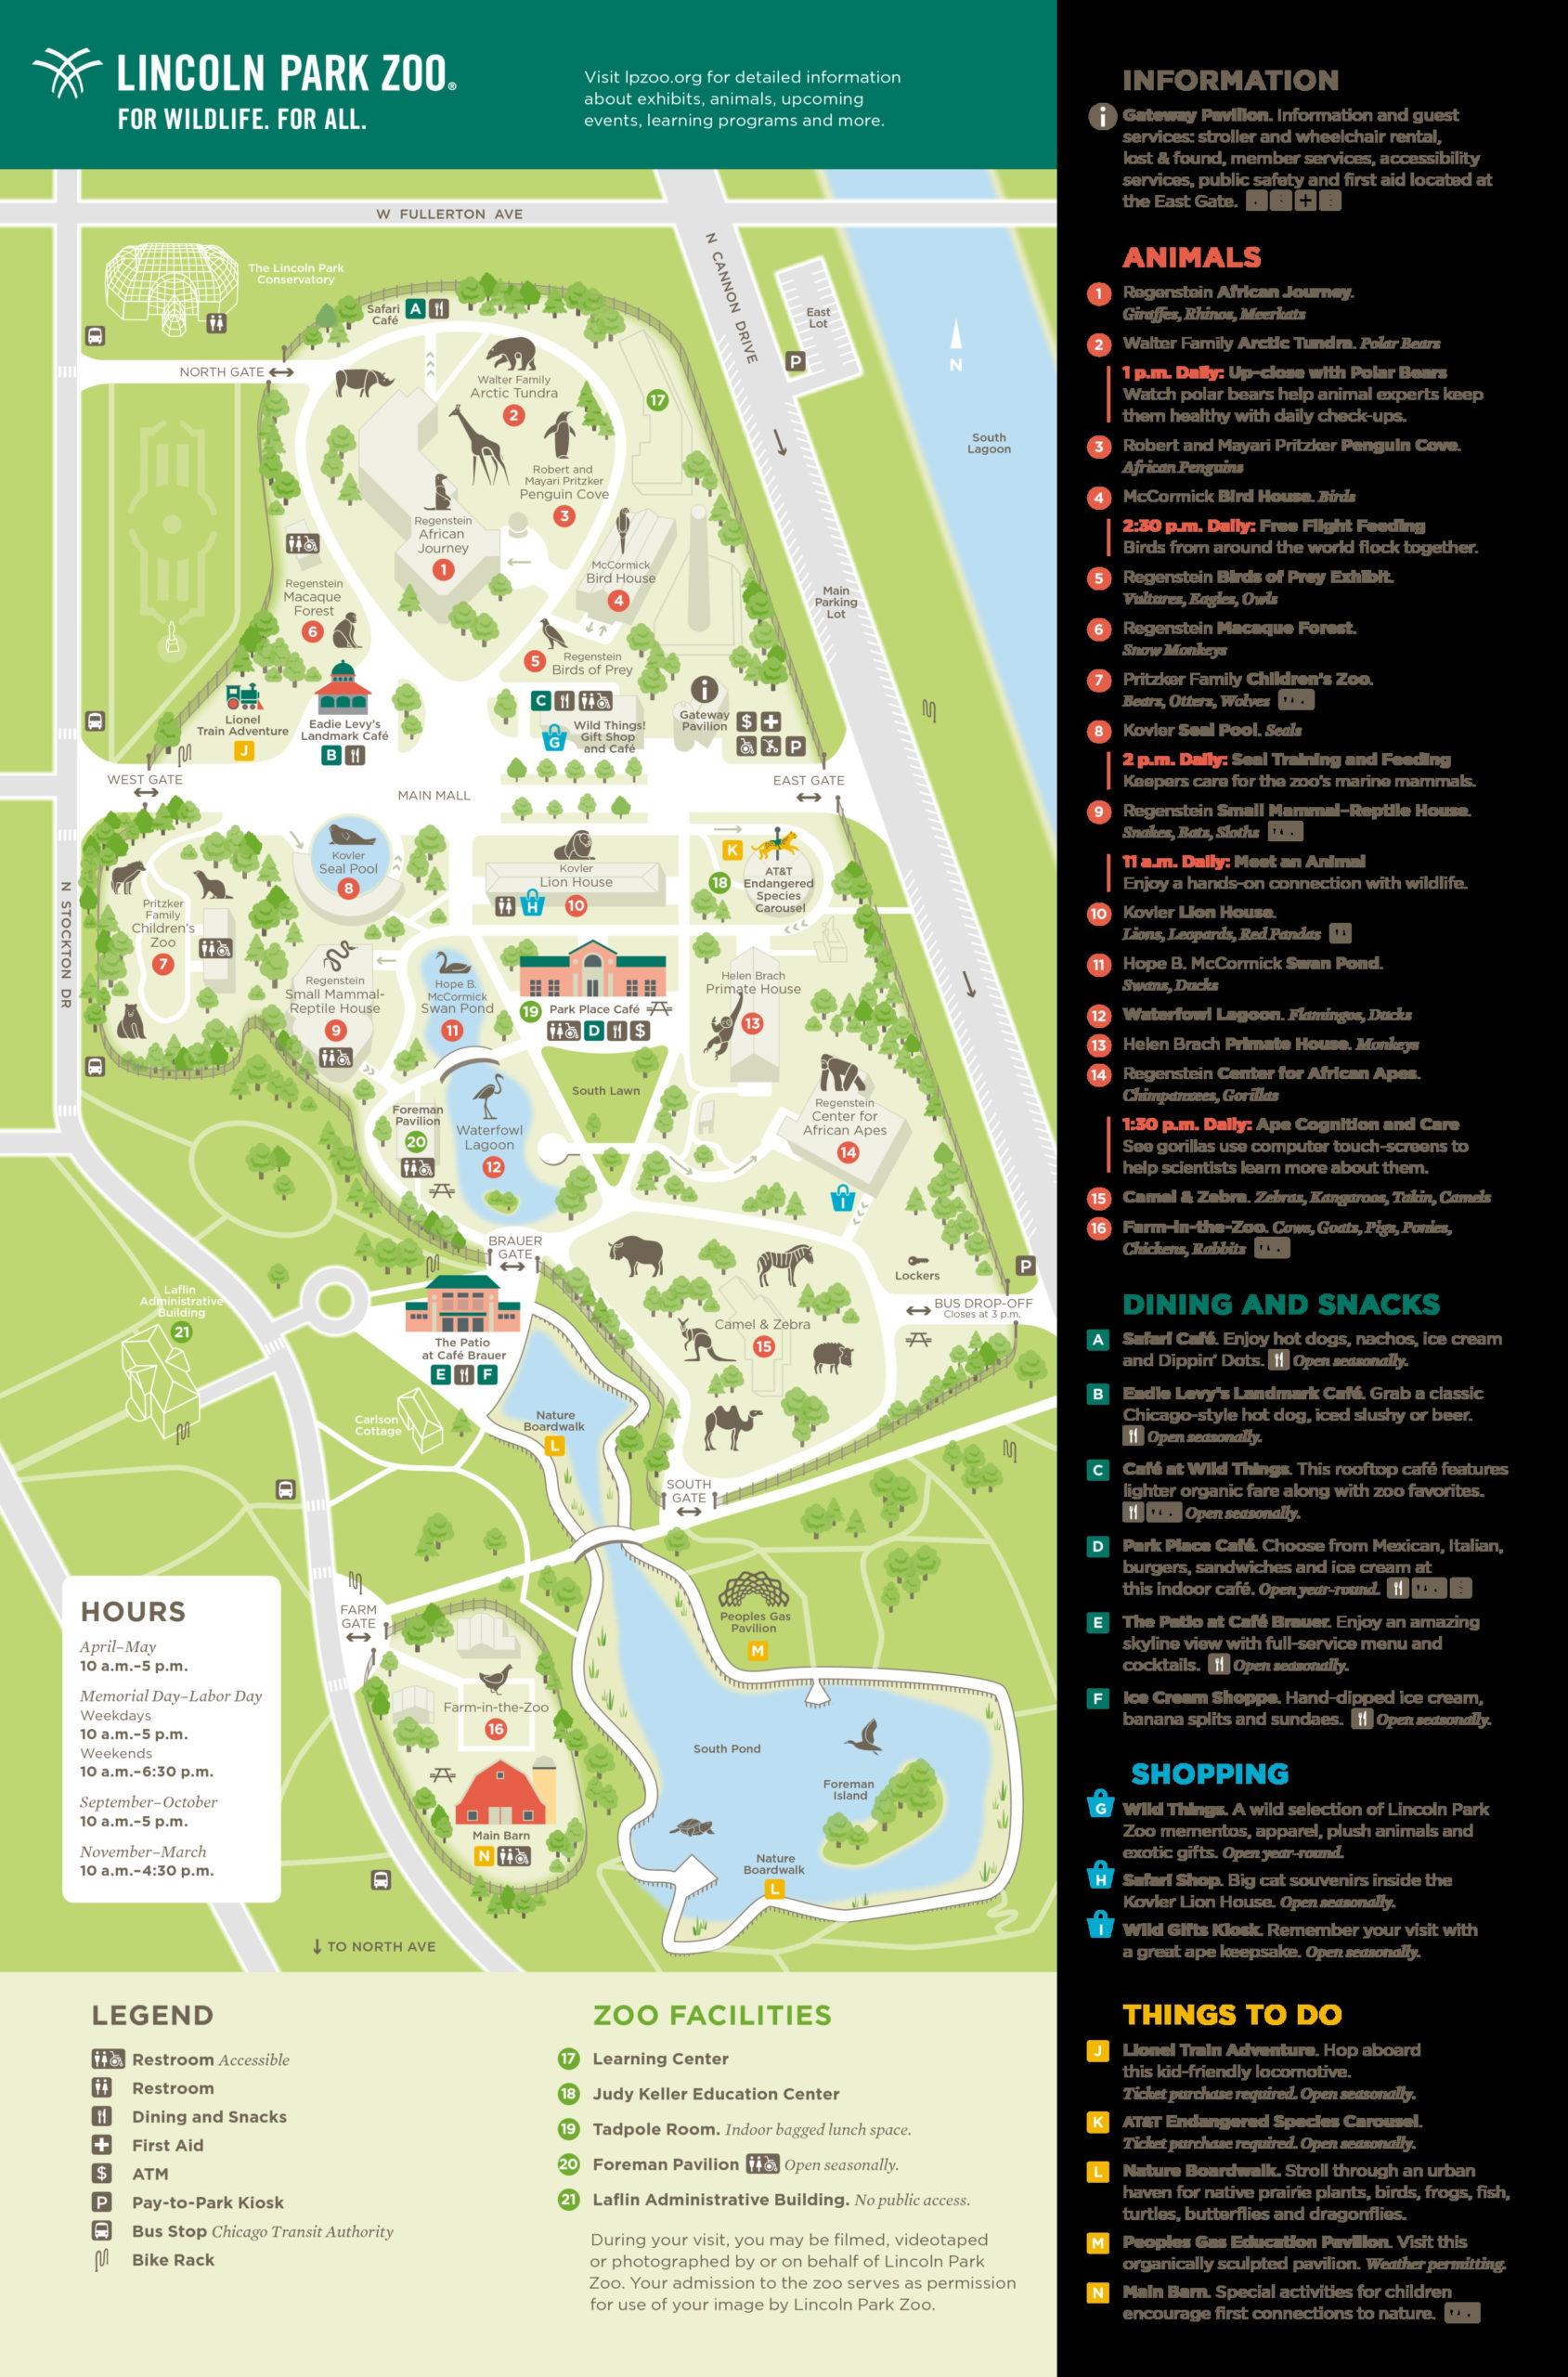 Lincoln Park Zoo Chicago IL Zoo Location